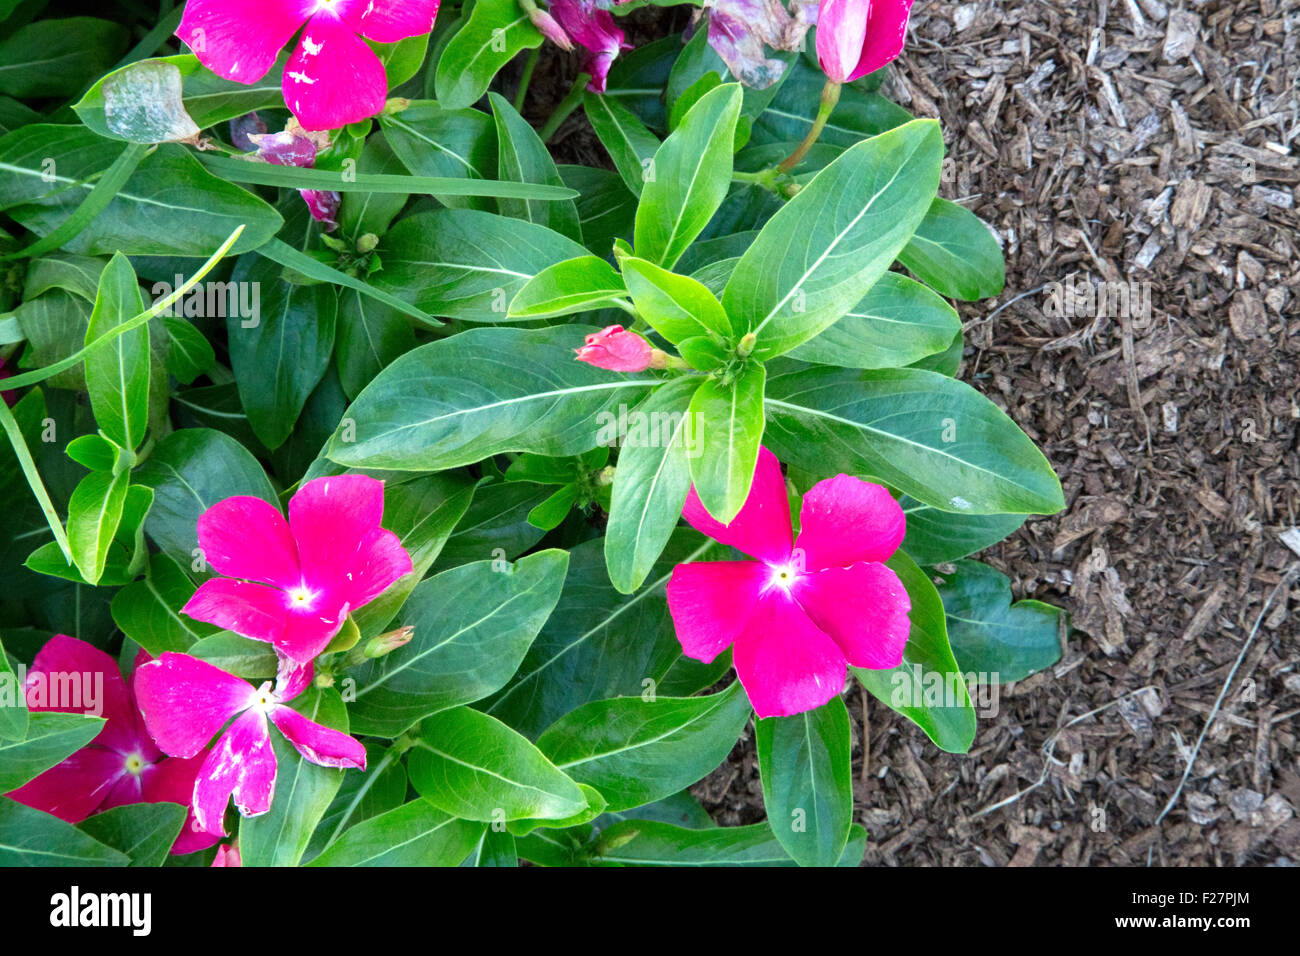 Pink mediterranean flower stock photos pink mediterranean flower lots of small pink flowers catharanthus mediterranean hot rose stock image mightylinksfo